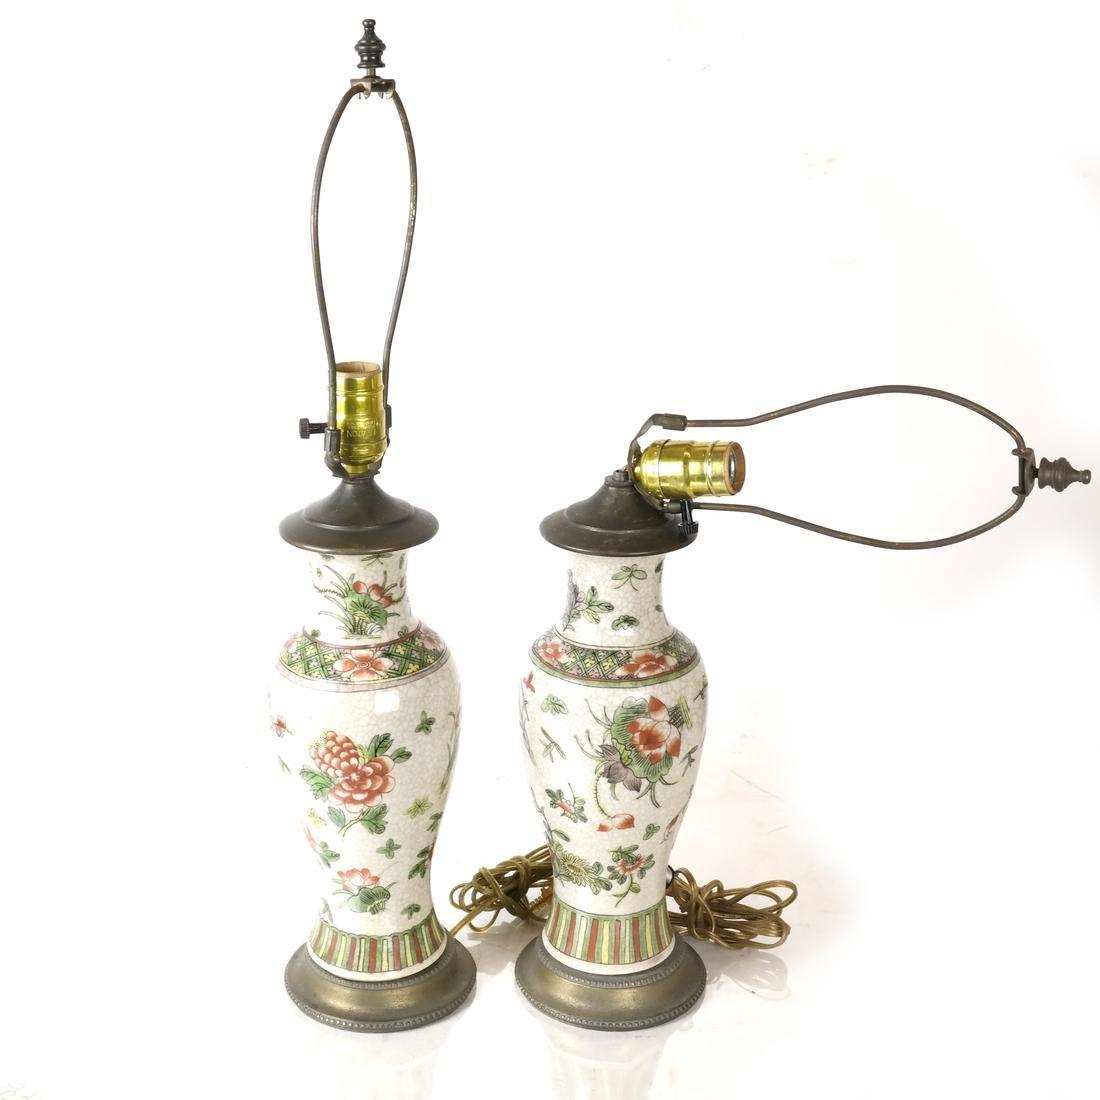 Pair of Asian Crackleware Decorated Lamps